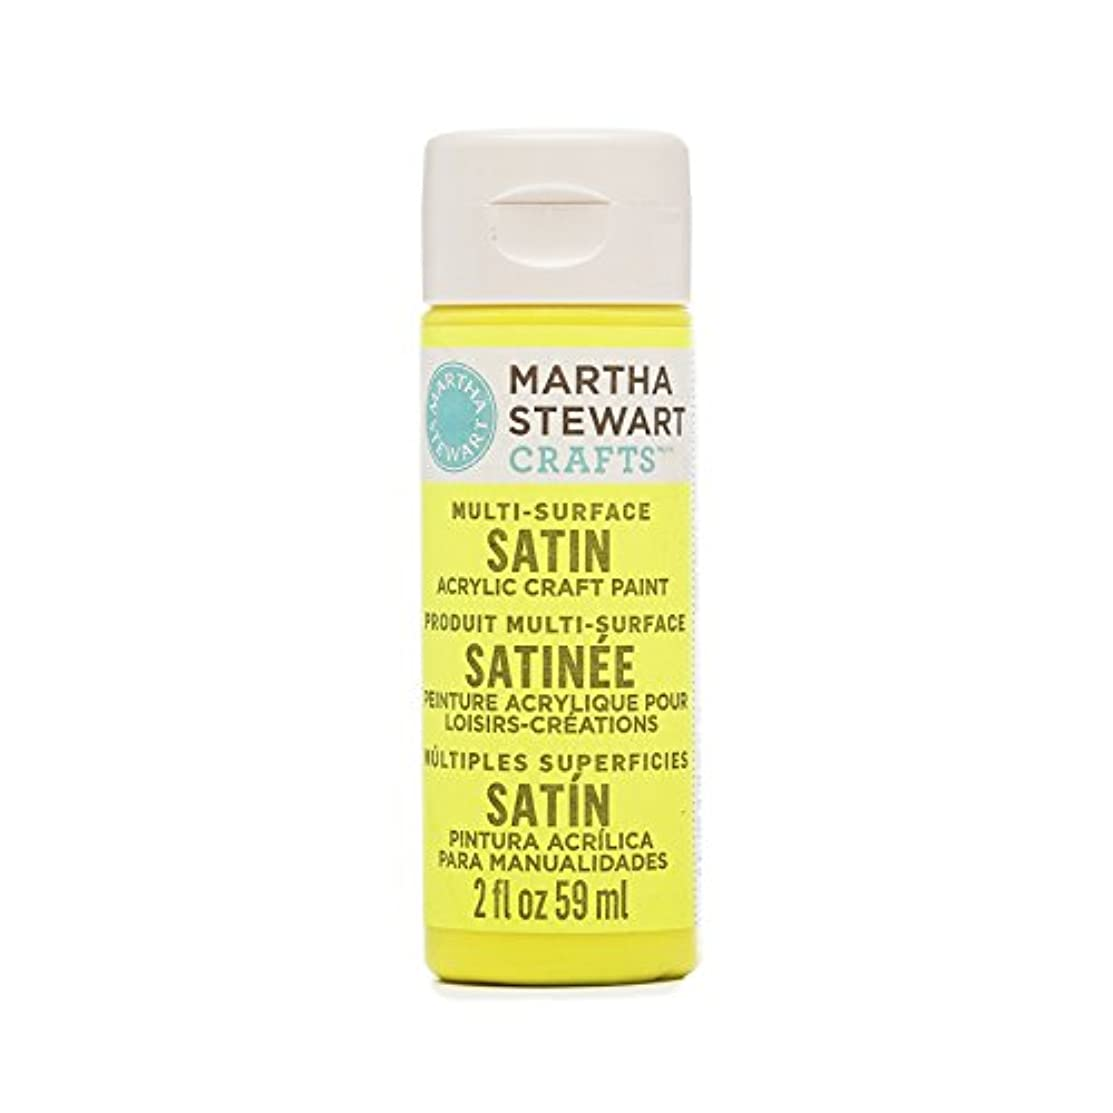 Martha Stewart 33486 Multi-Surface Satin Acrylic Lightning Bug, 2 oz Paint, 9 oz,